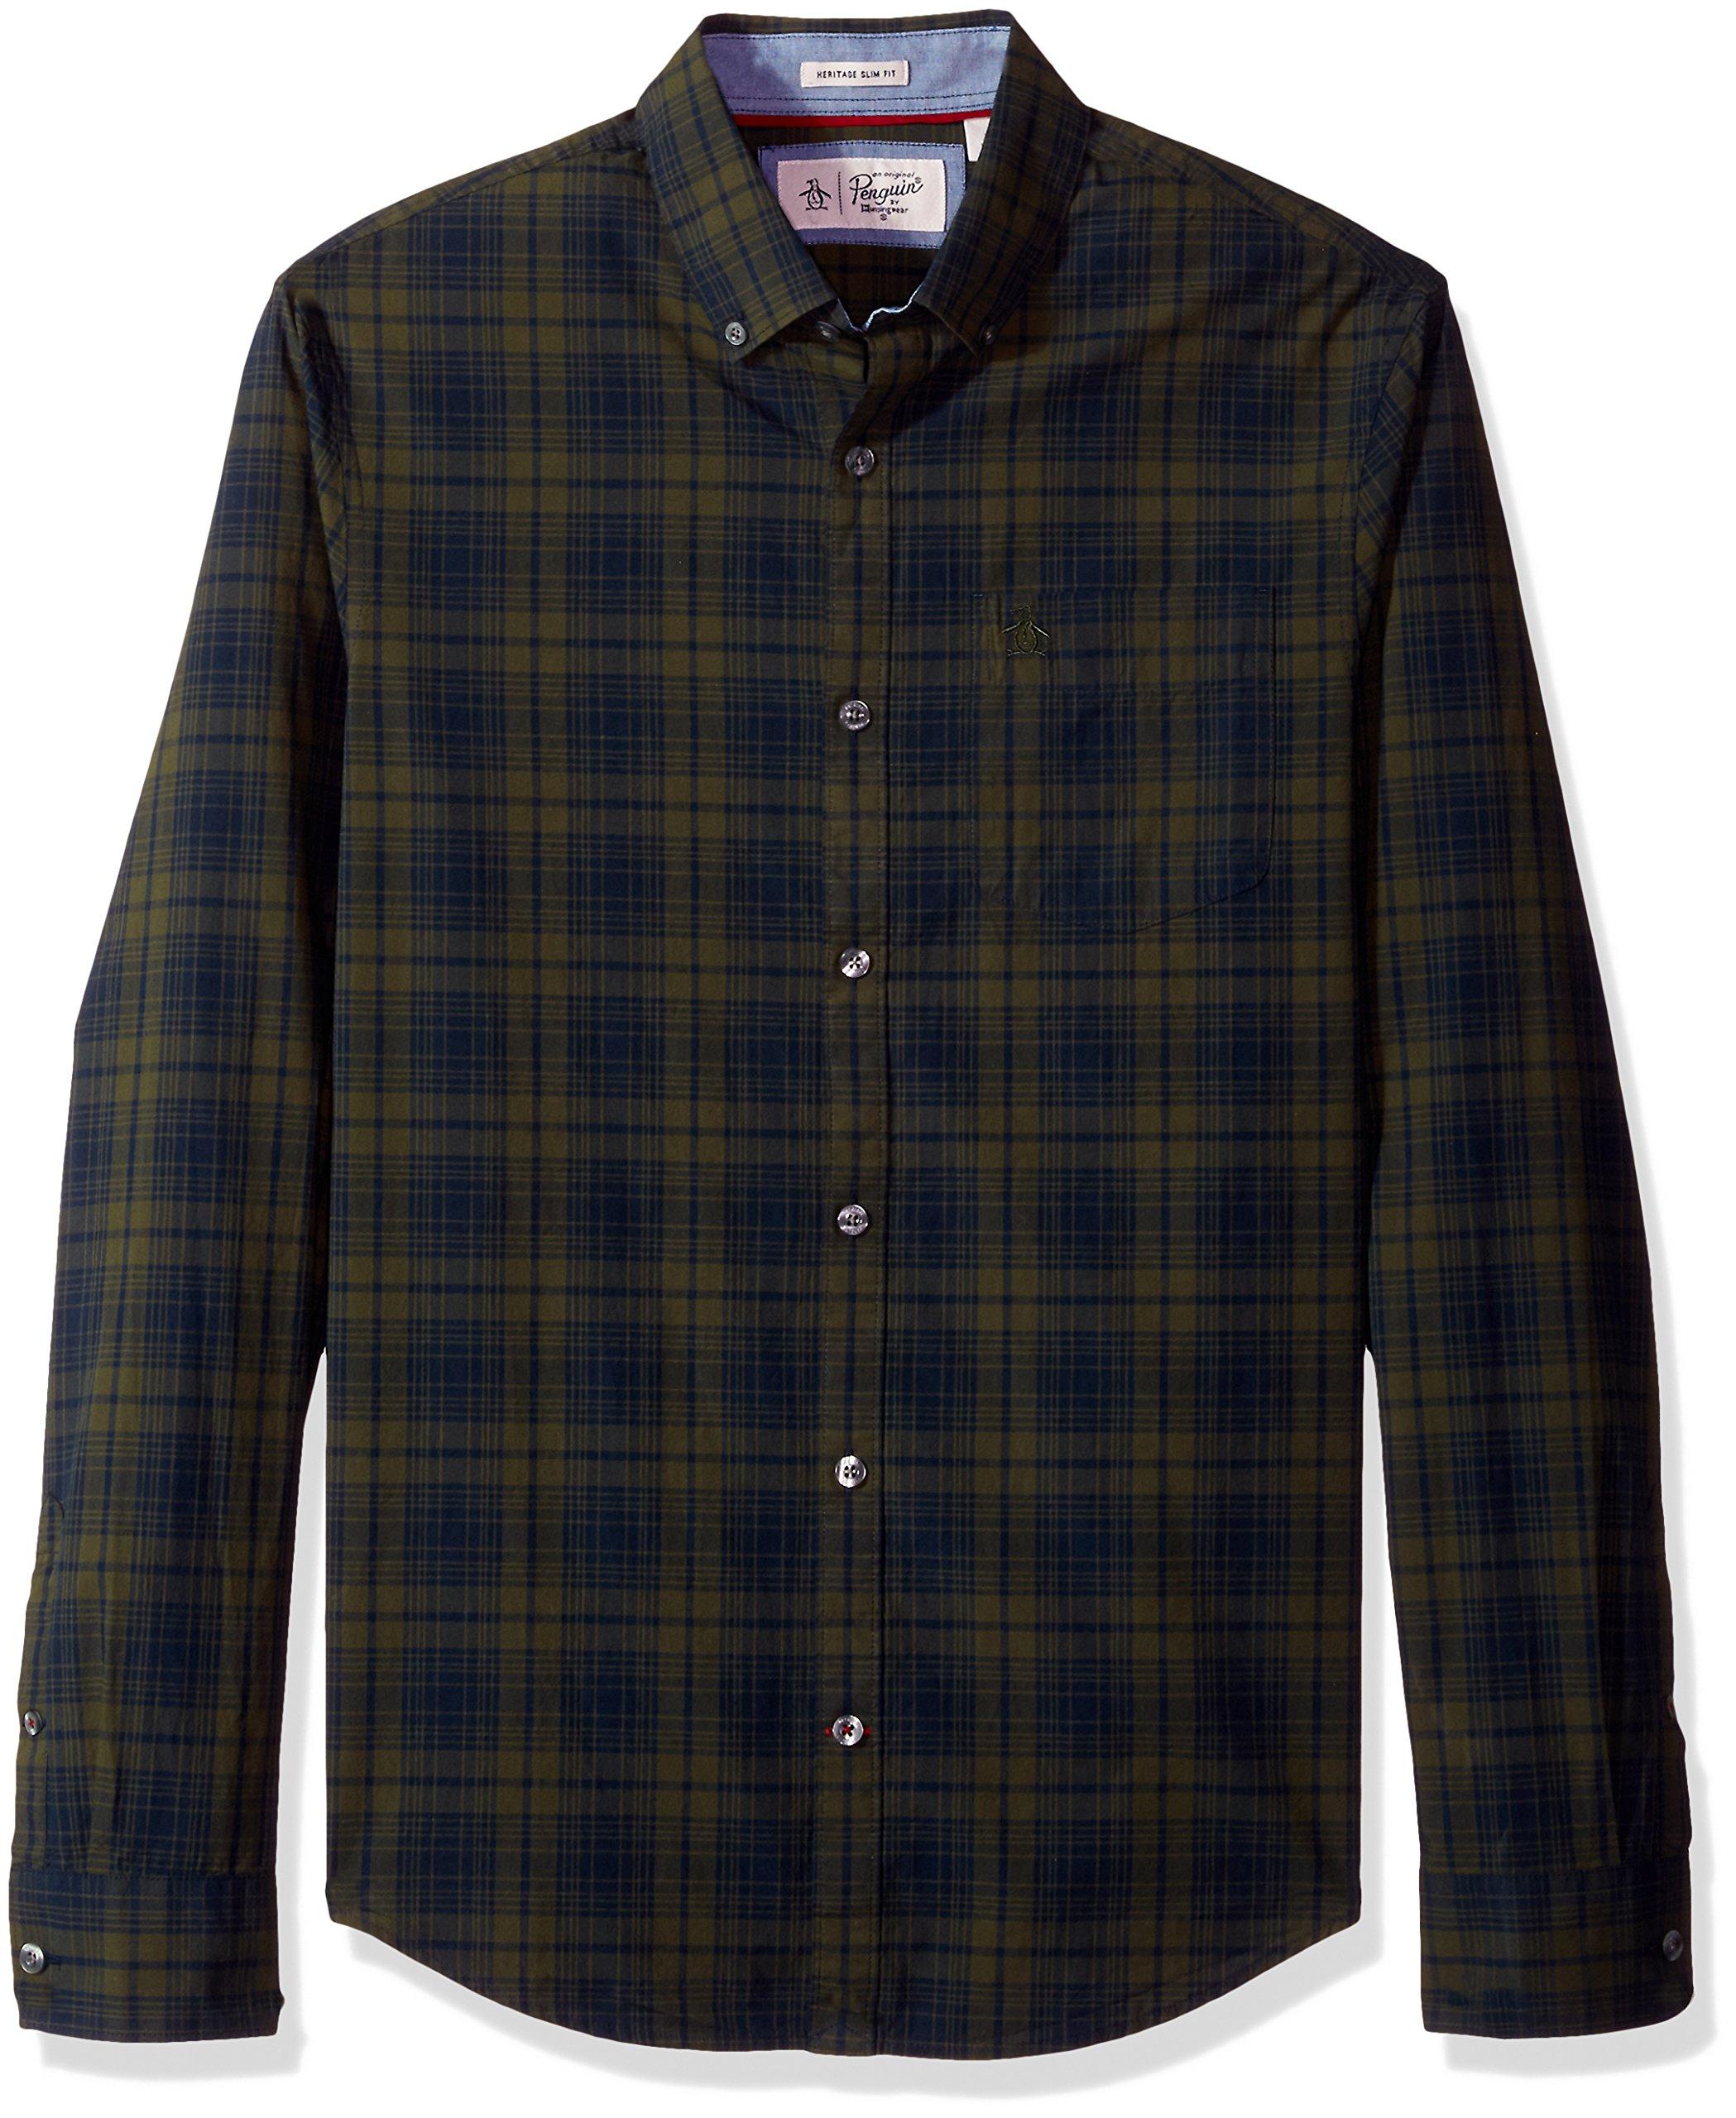 Original Penguin Men's P55 Plaid Shirt, Forest Night, Extra Large